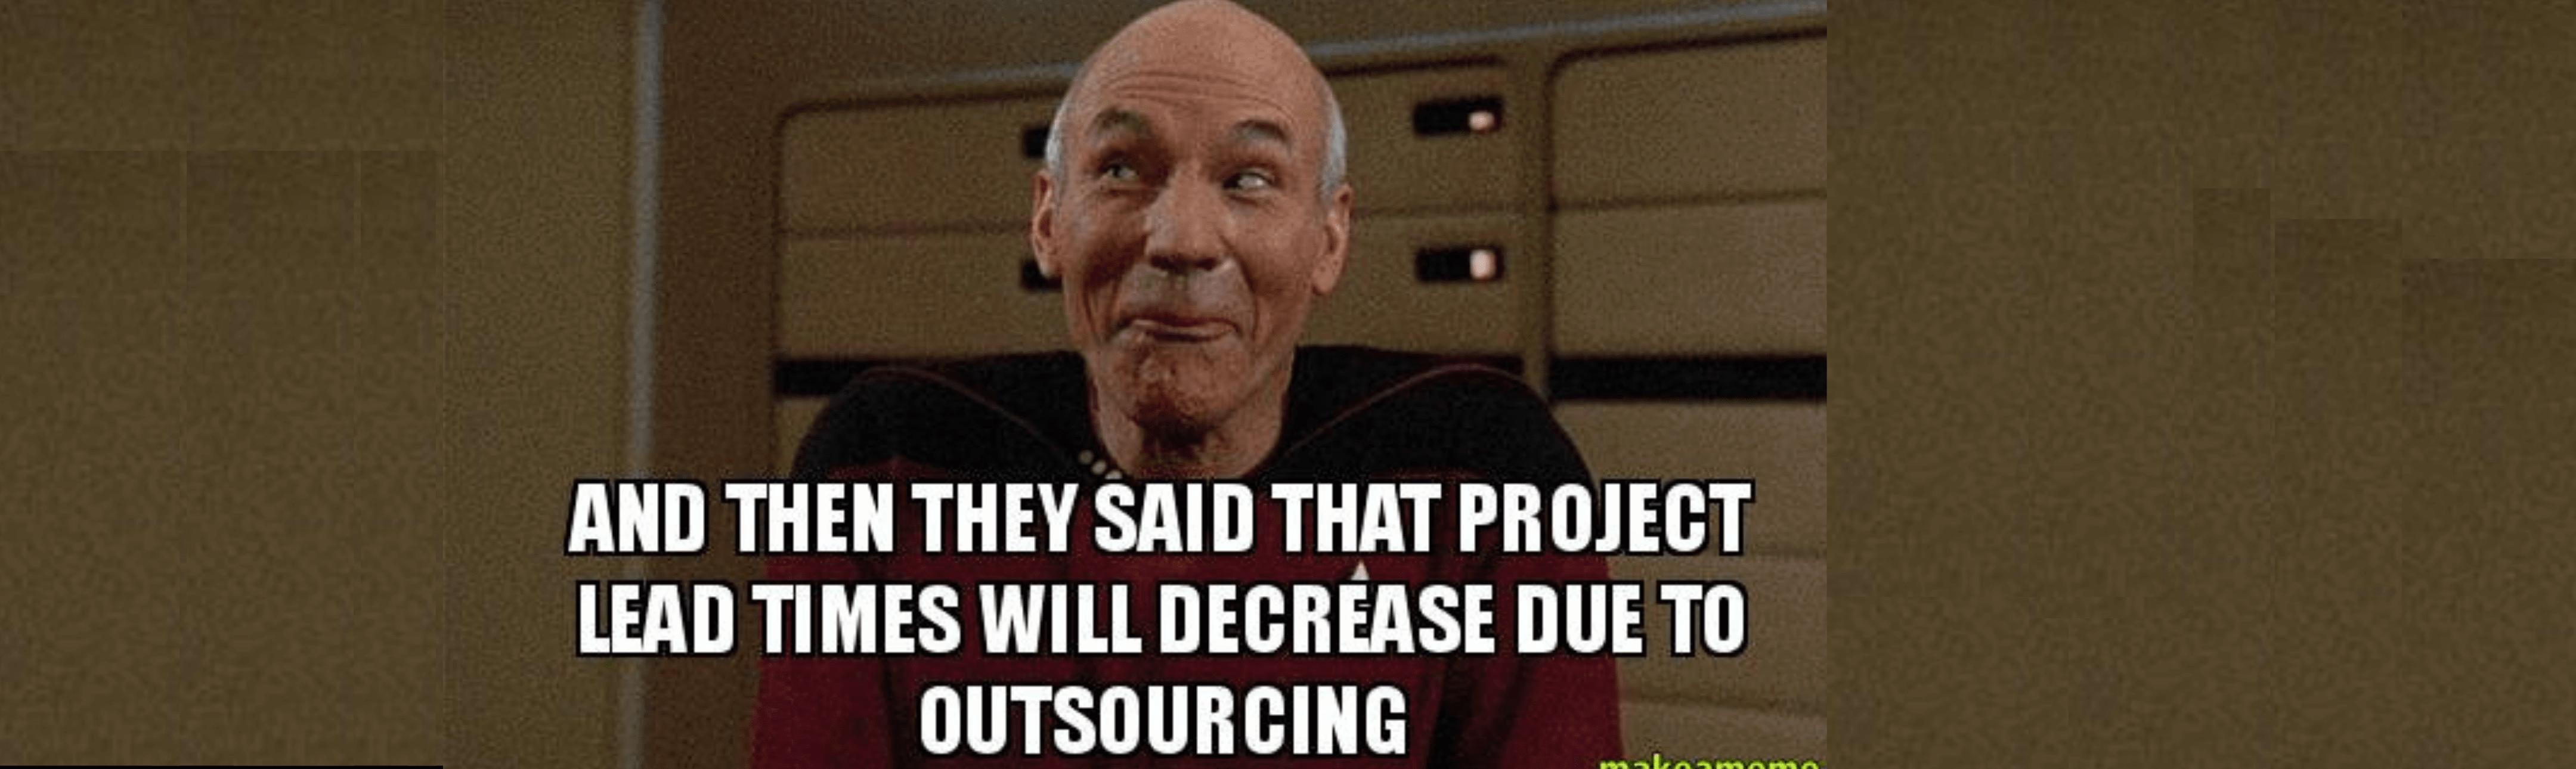 Outsourcing Company